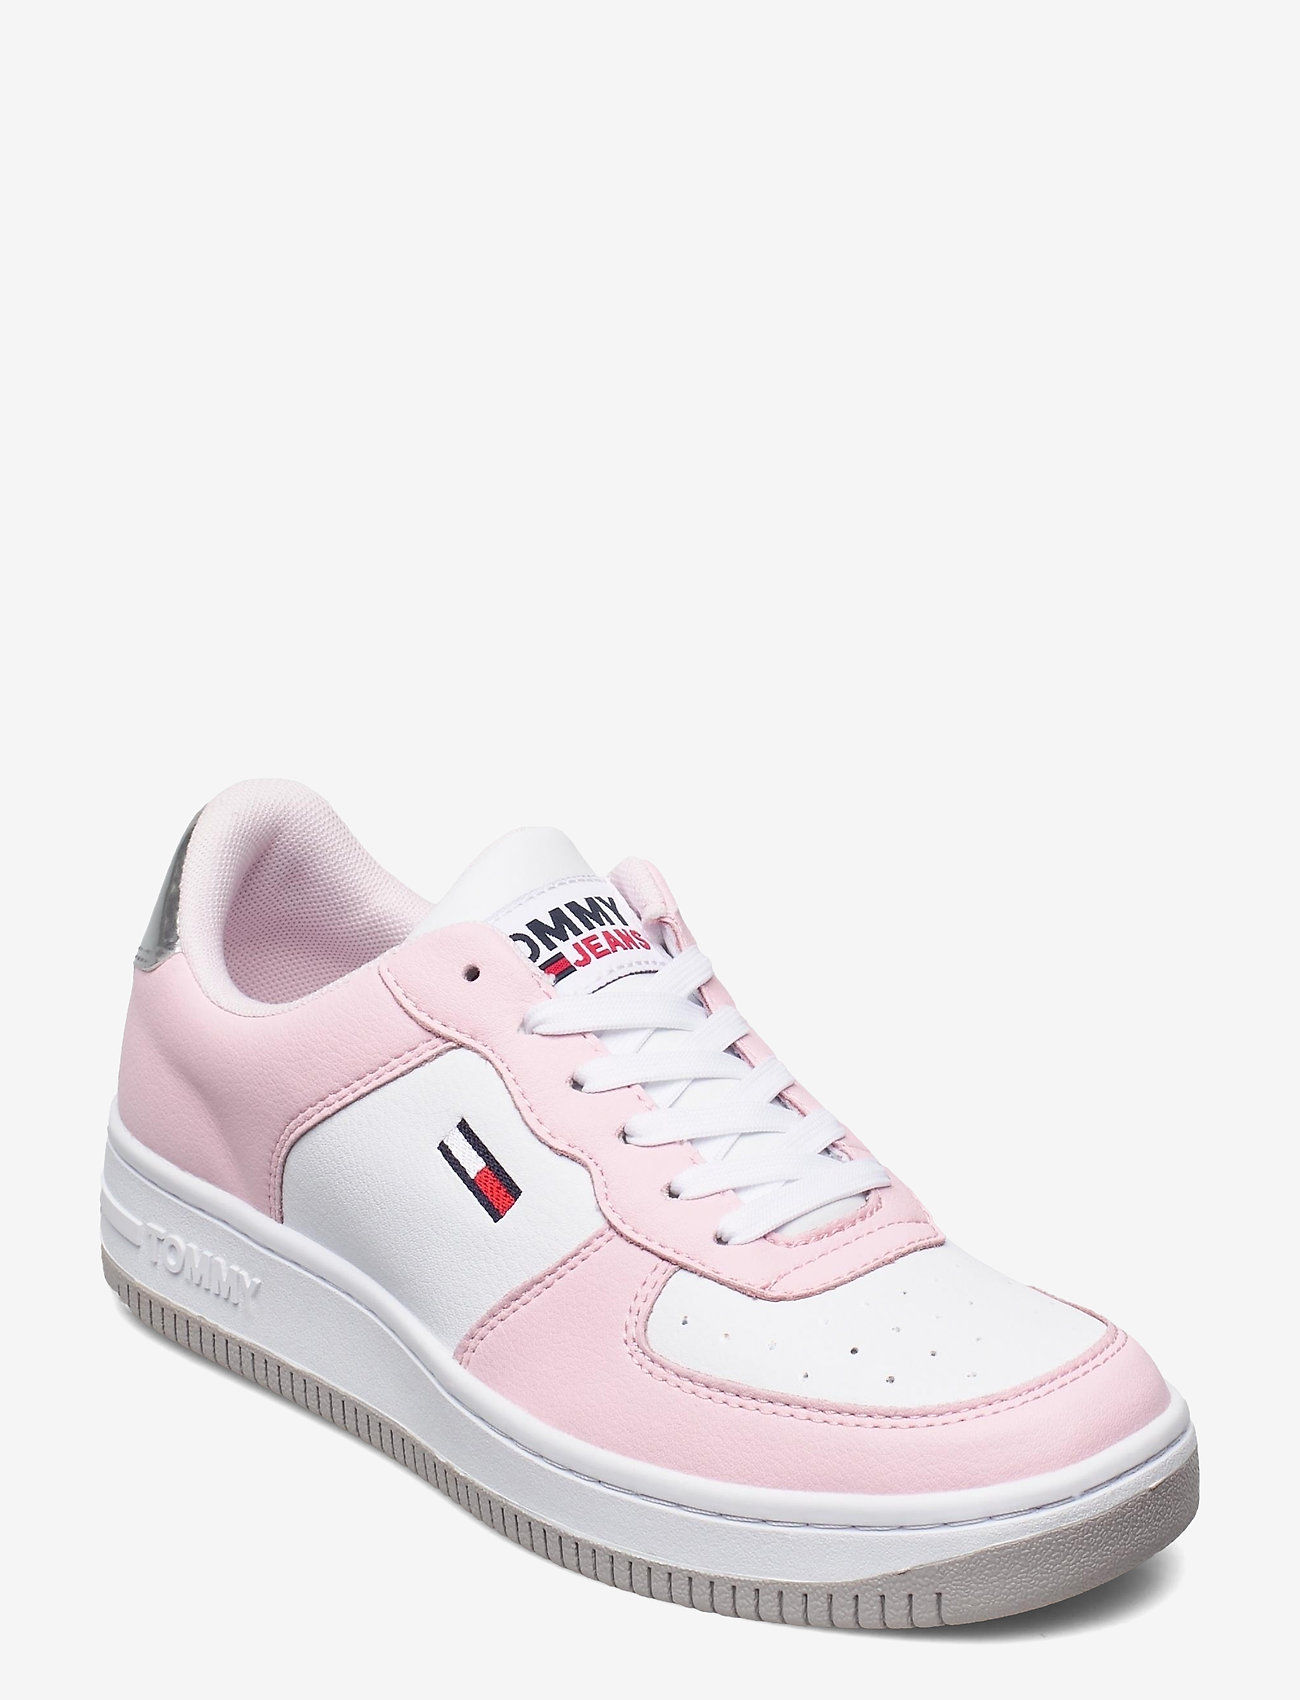 Tommy Hilfiger - WMNS TOMMY JEANS BASKET SNEAKER - low top sneakers - light pink - 0